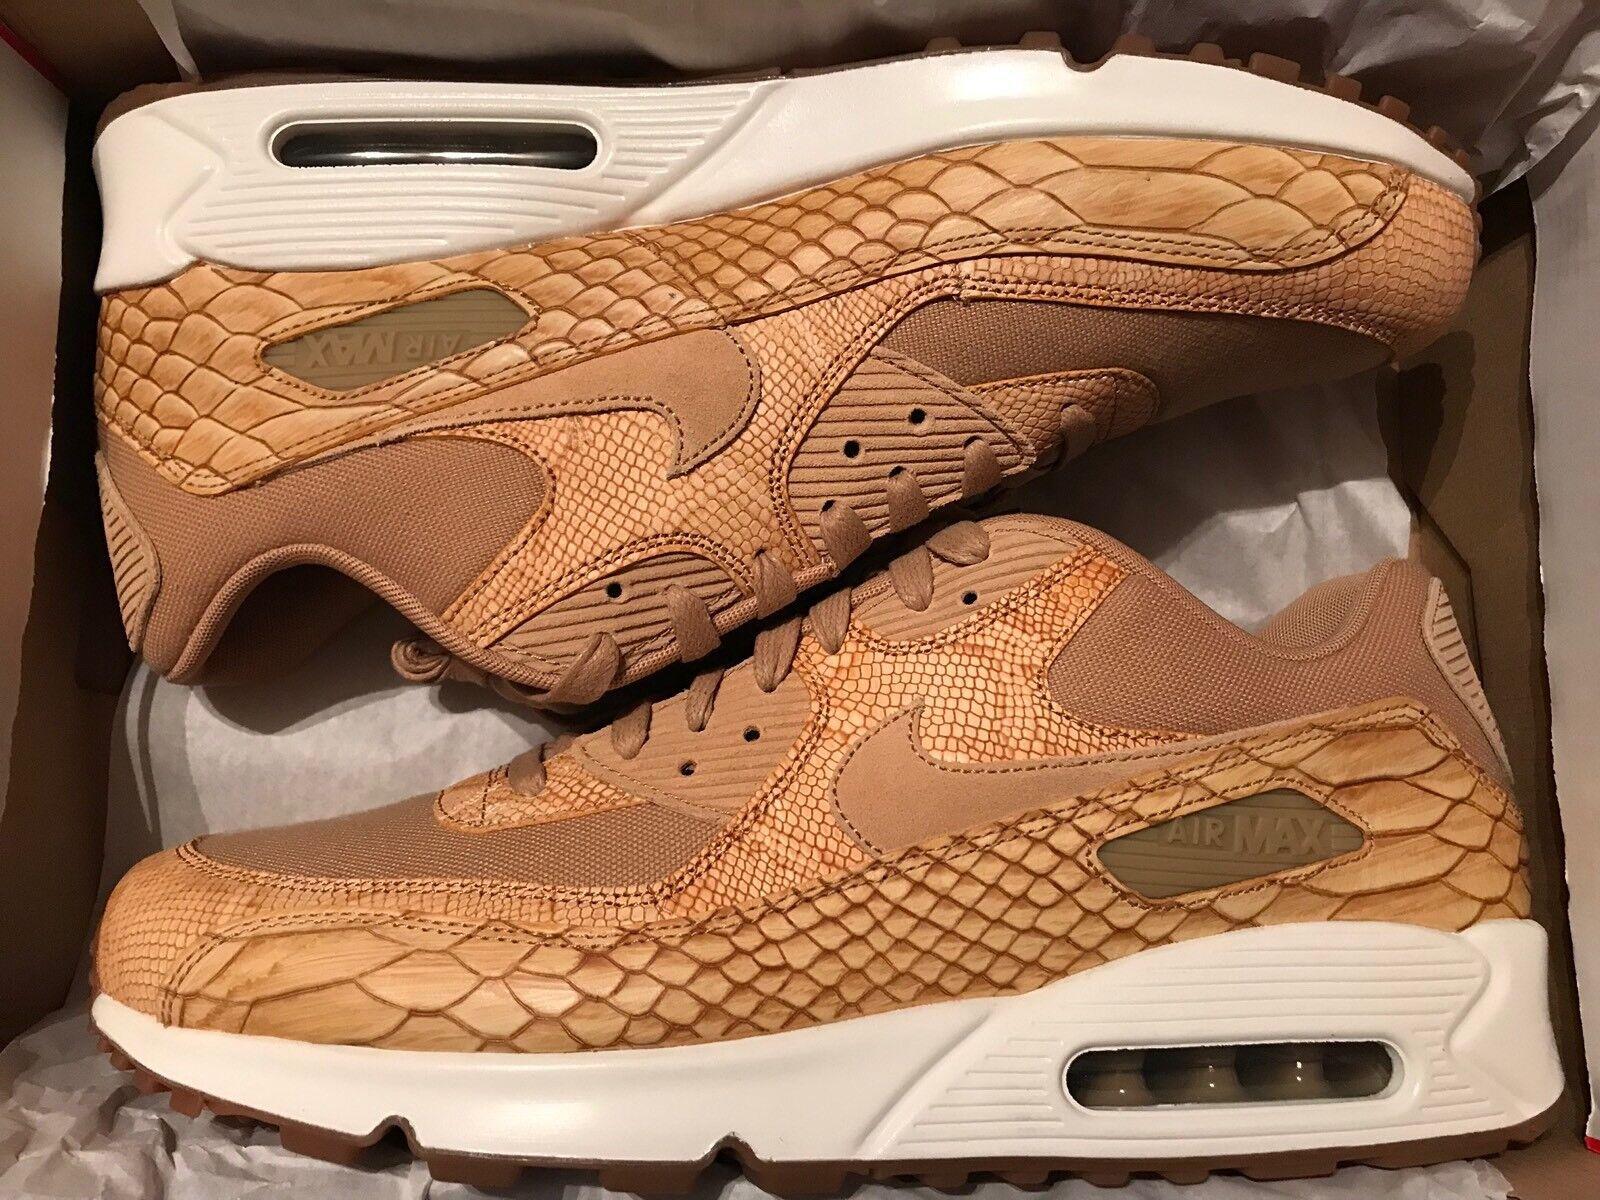 Nike Air Max 90 Premium LTR Snake Skin Pack ah8046-200 Size 13 New